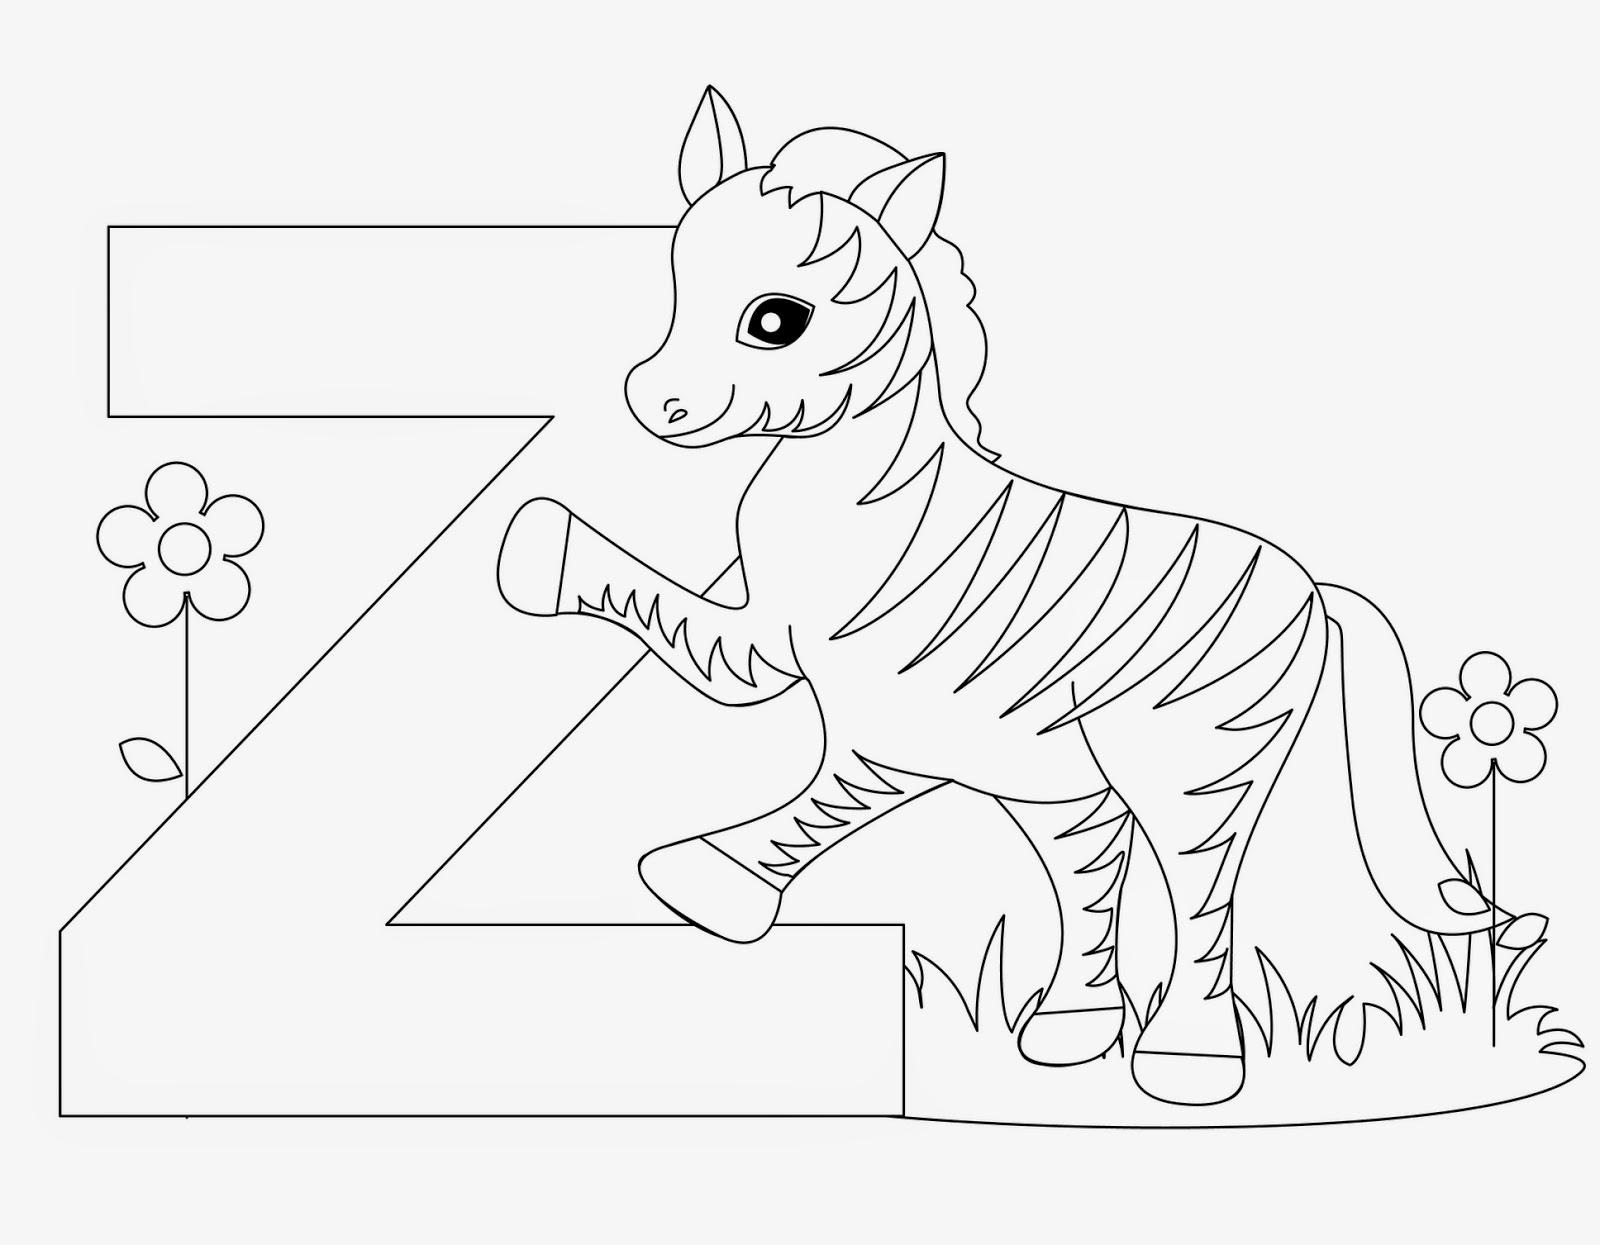 Kids Page: Z is for Zebra - Animal Alphabet Letters Worksheet